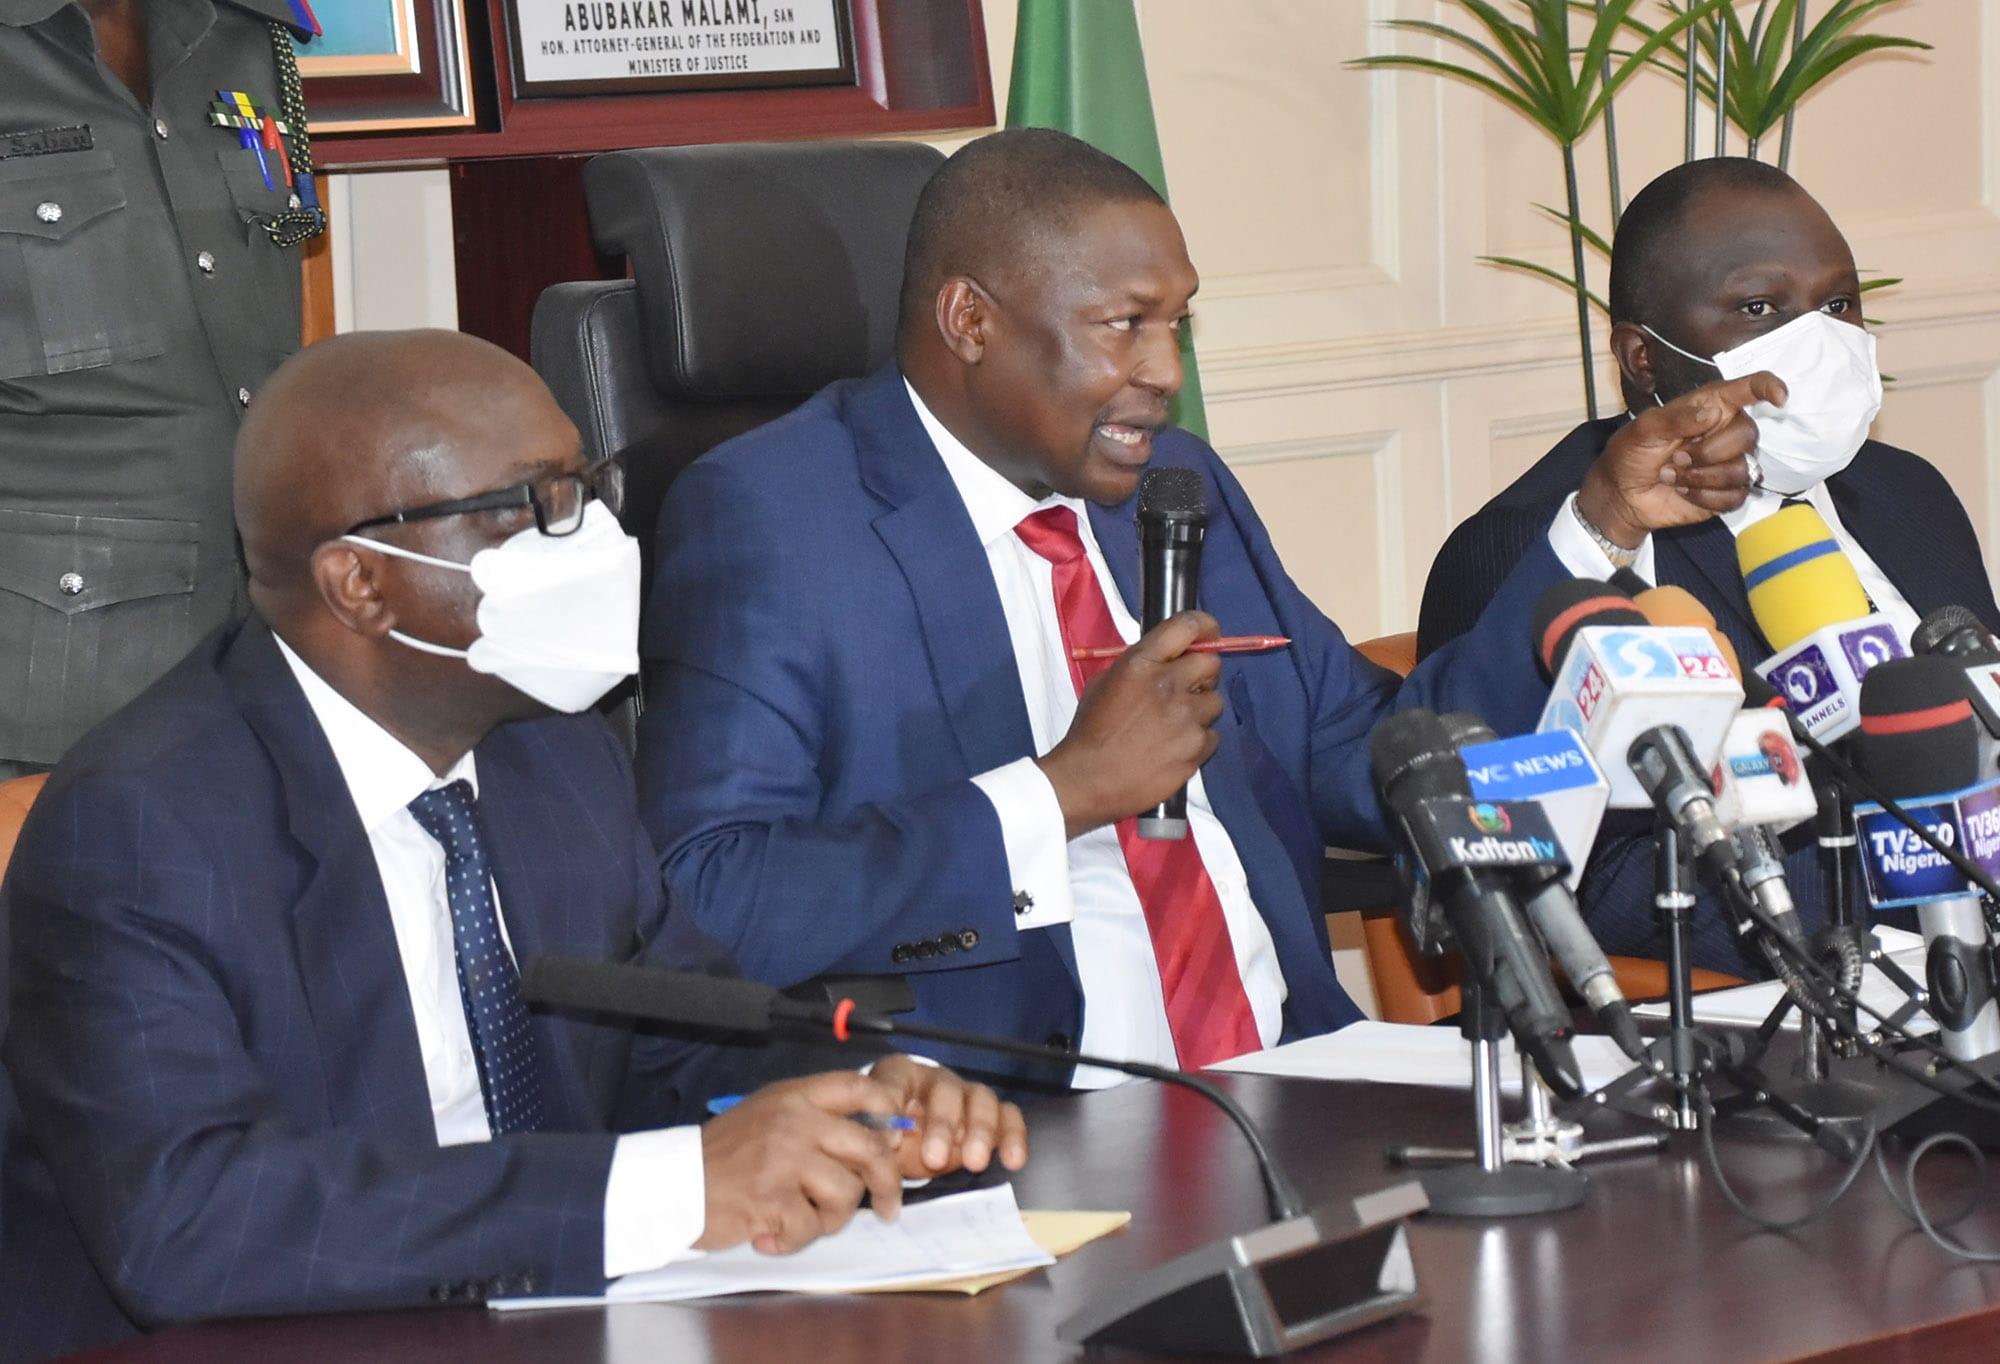 Malami assures judges, judicial workers of enhanced salaries